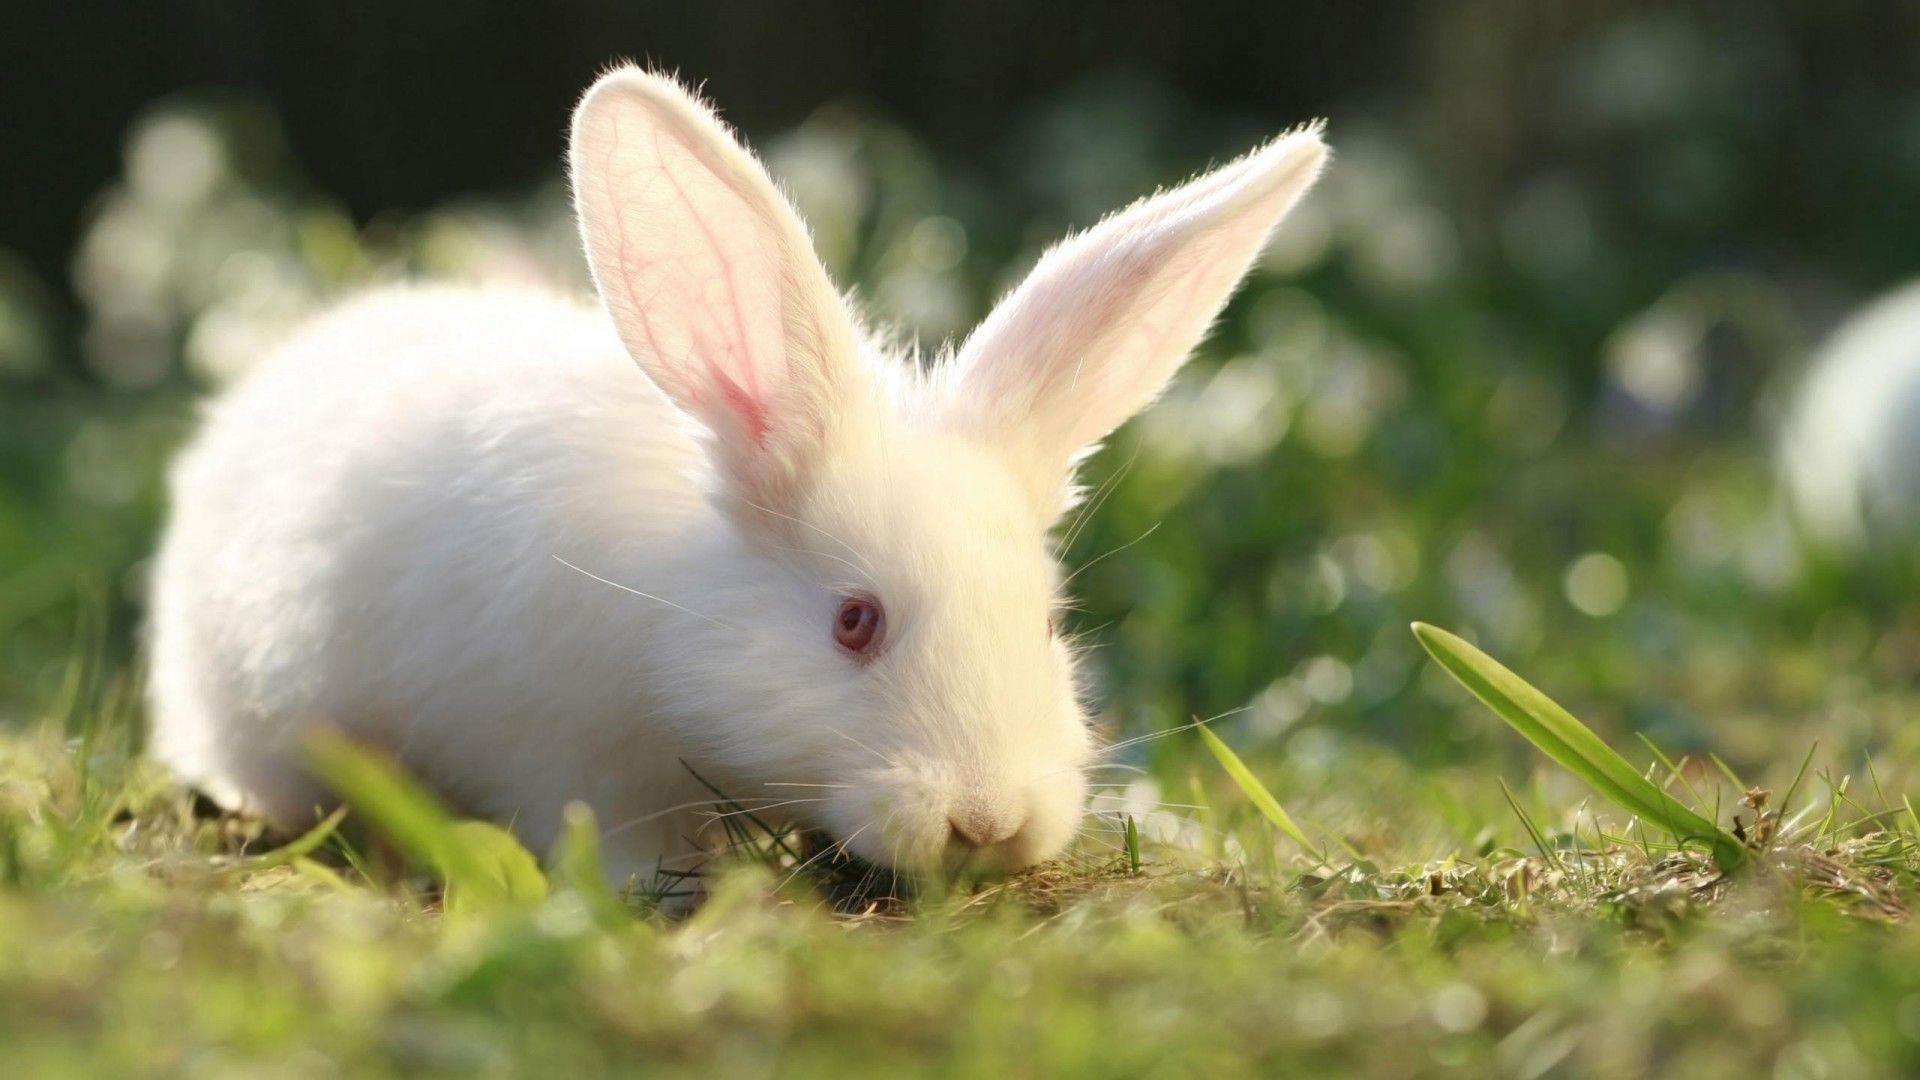 Bunny wallpaper image hd